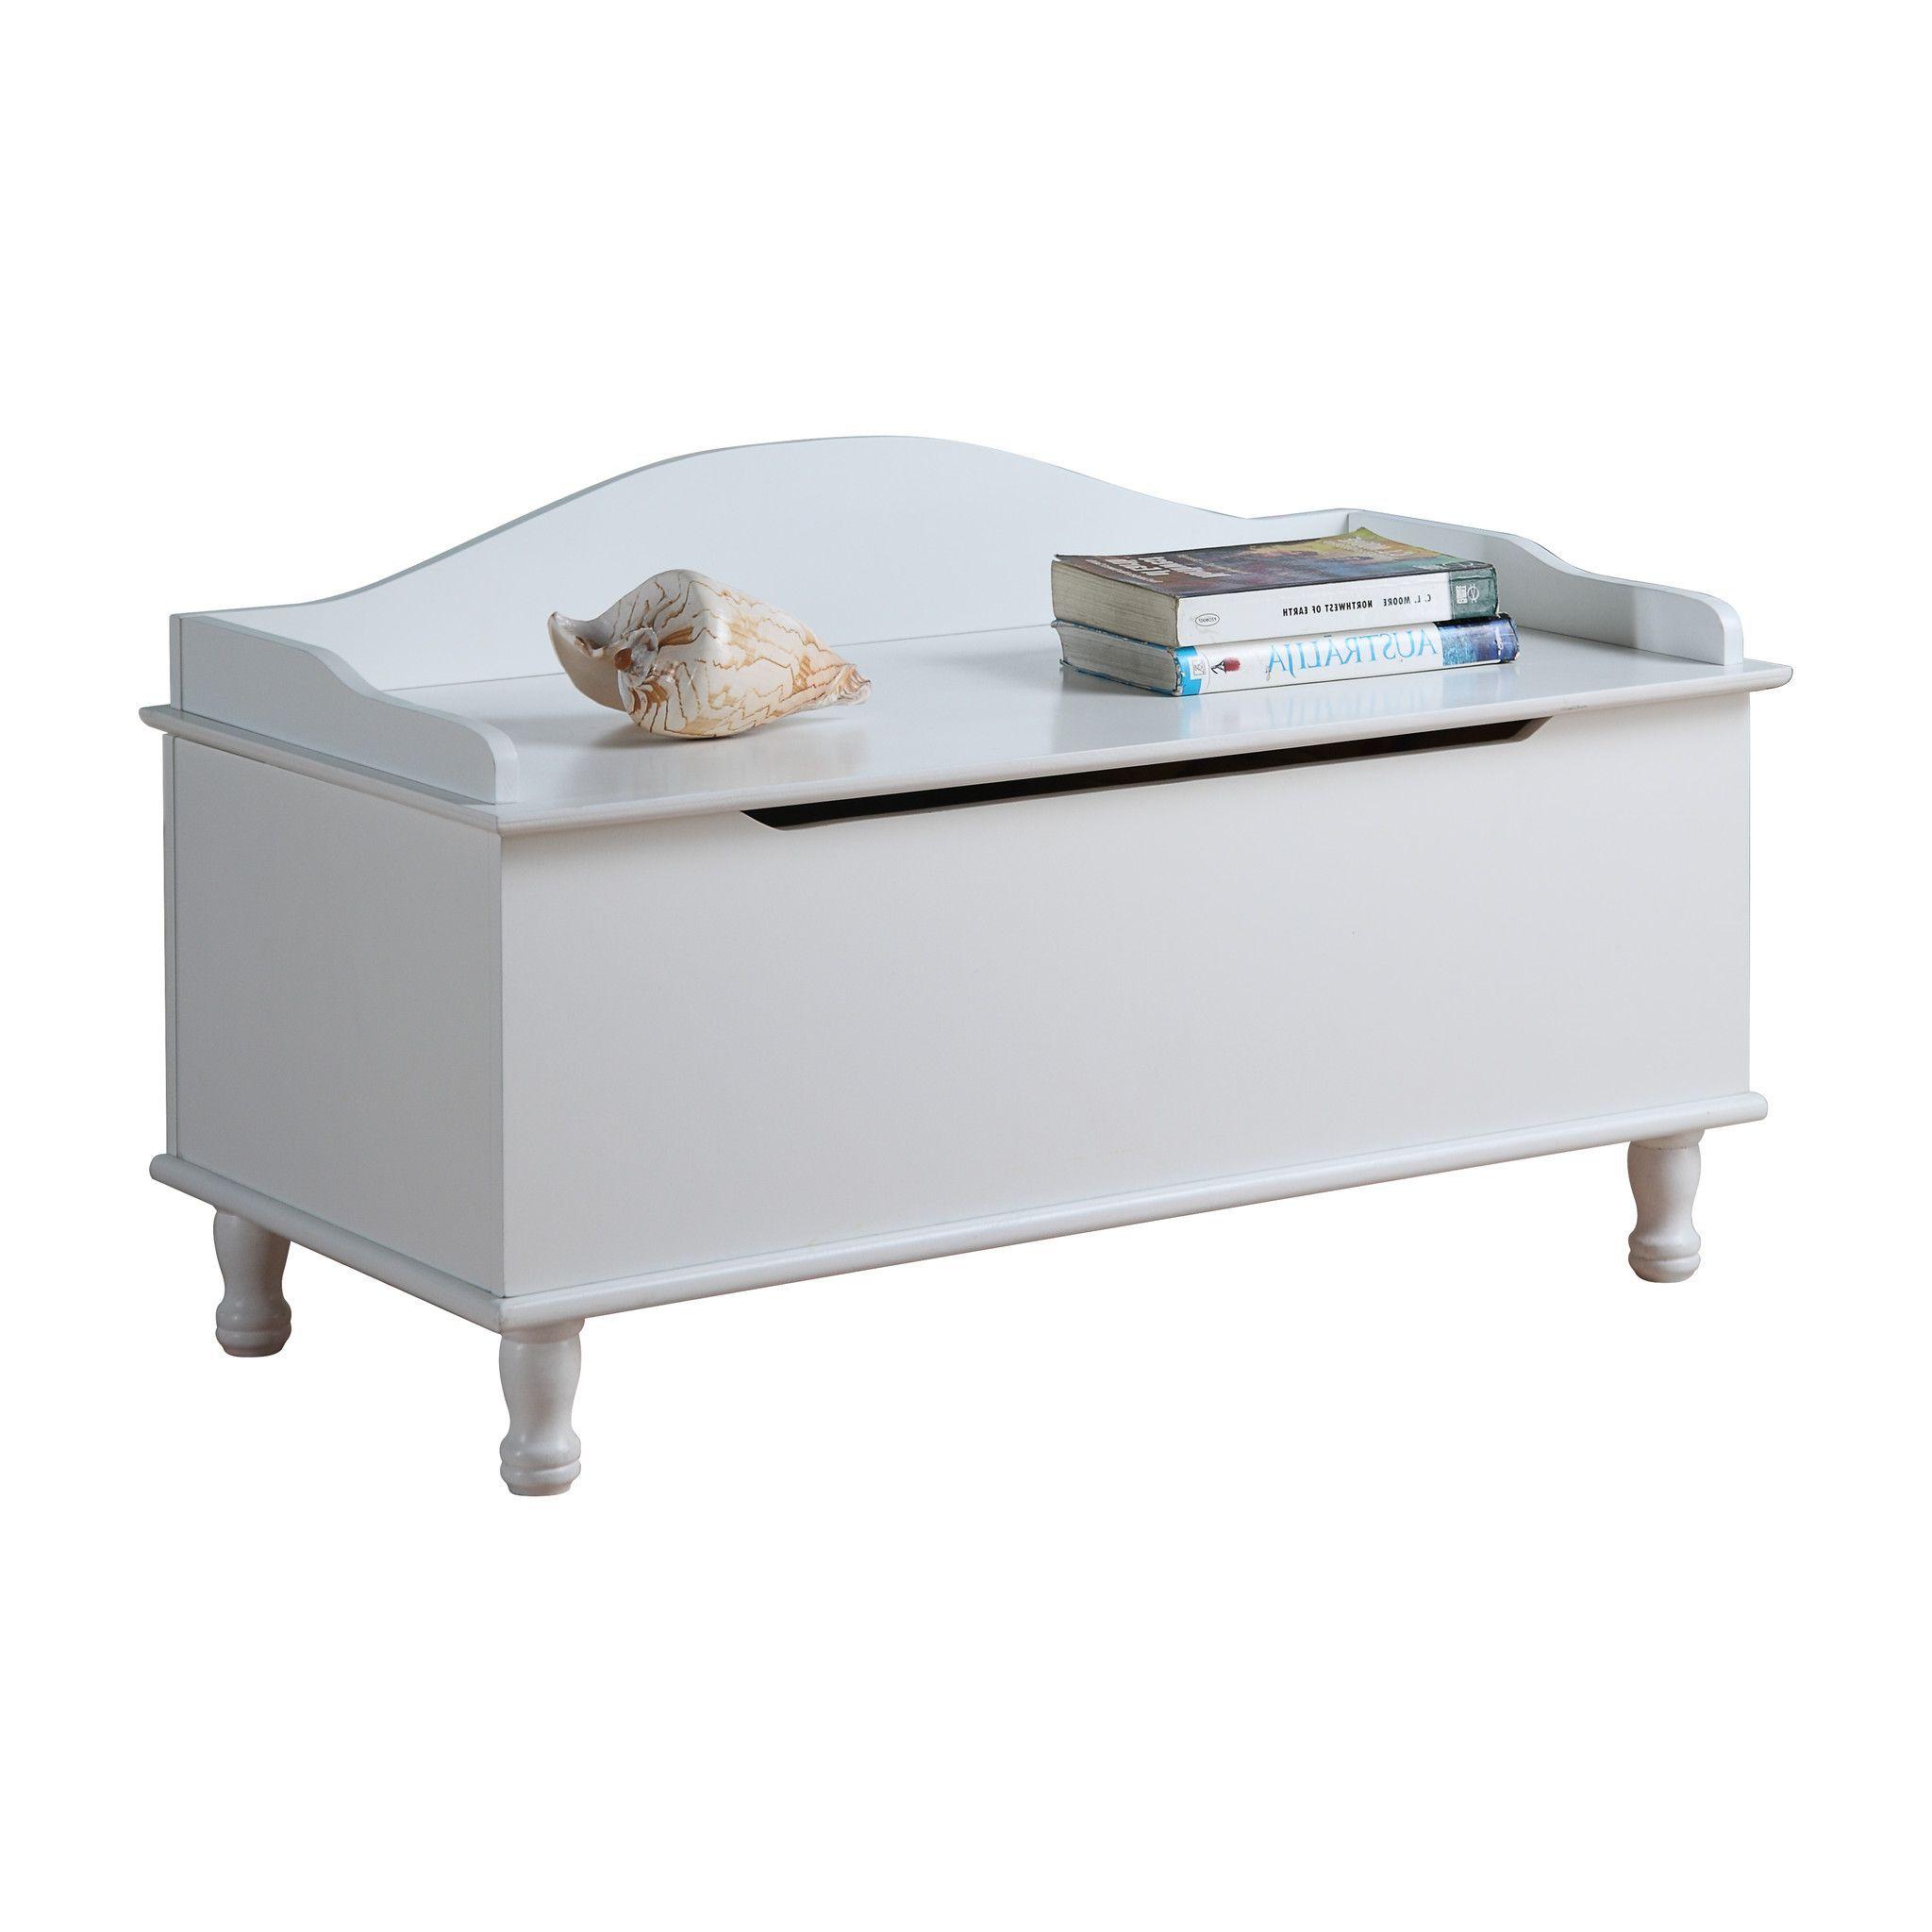 Pilaster designs white finish wood storage bench toy box chest